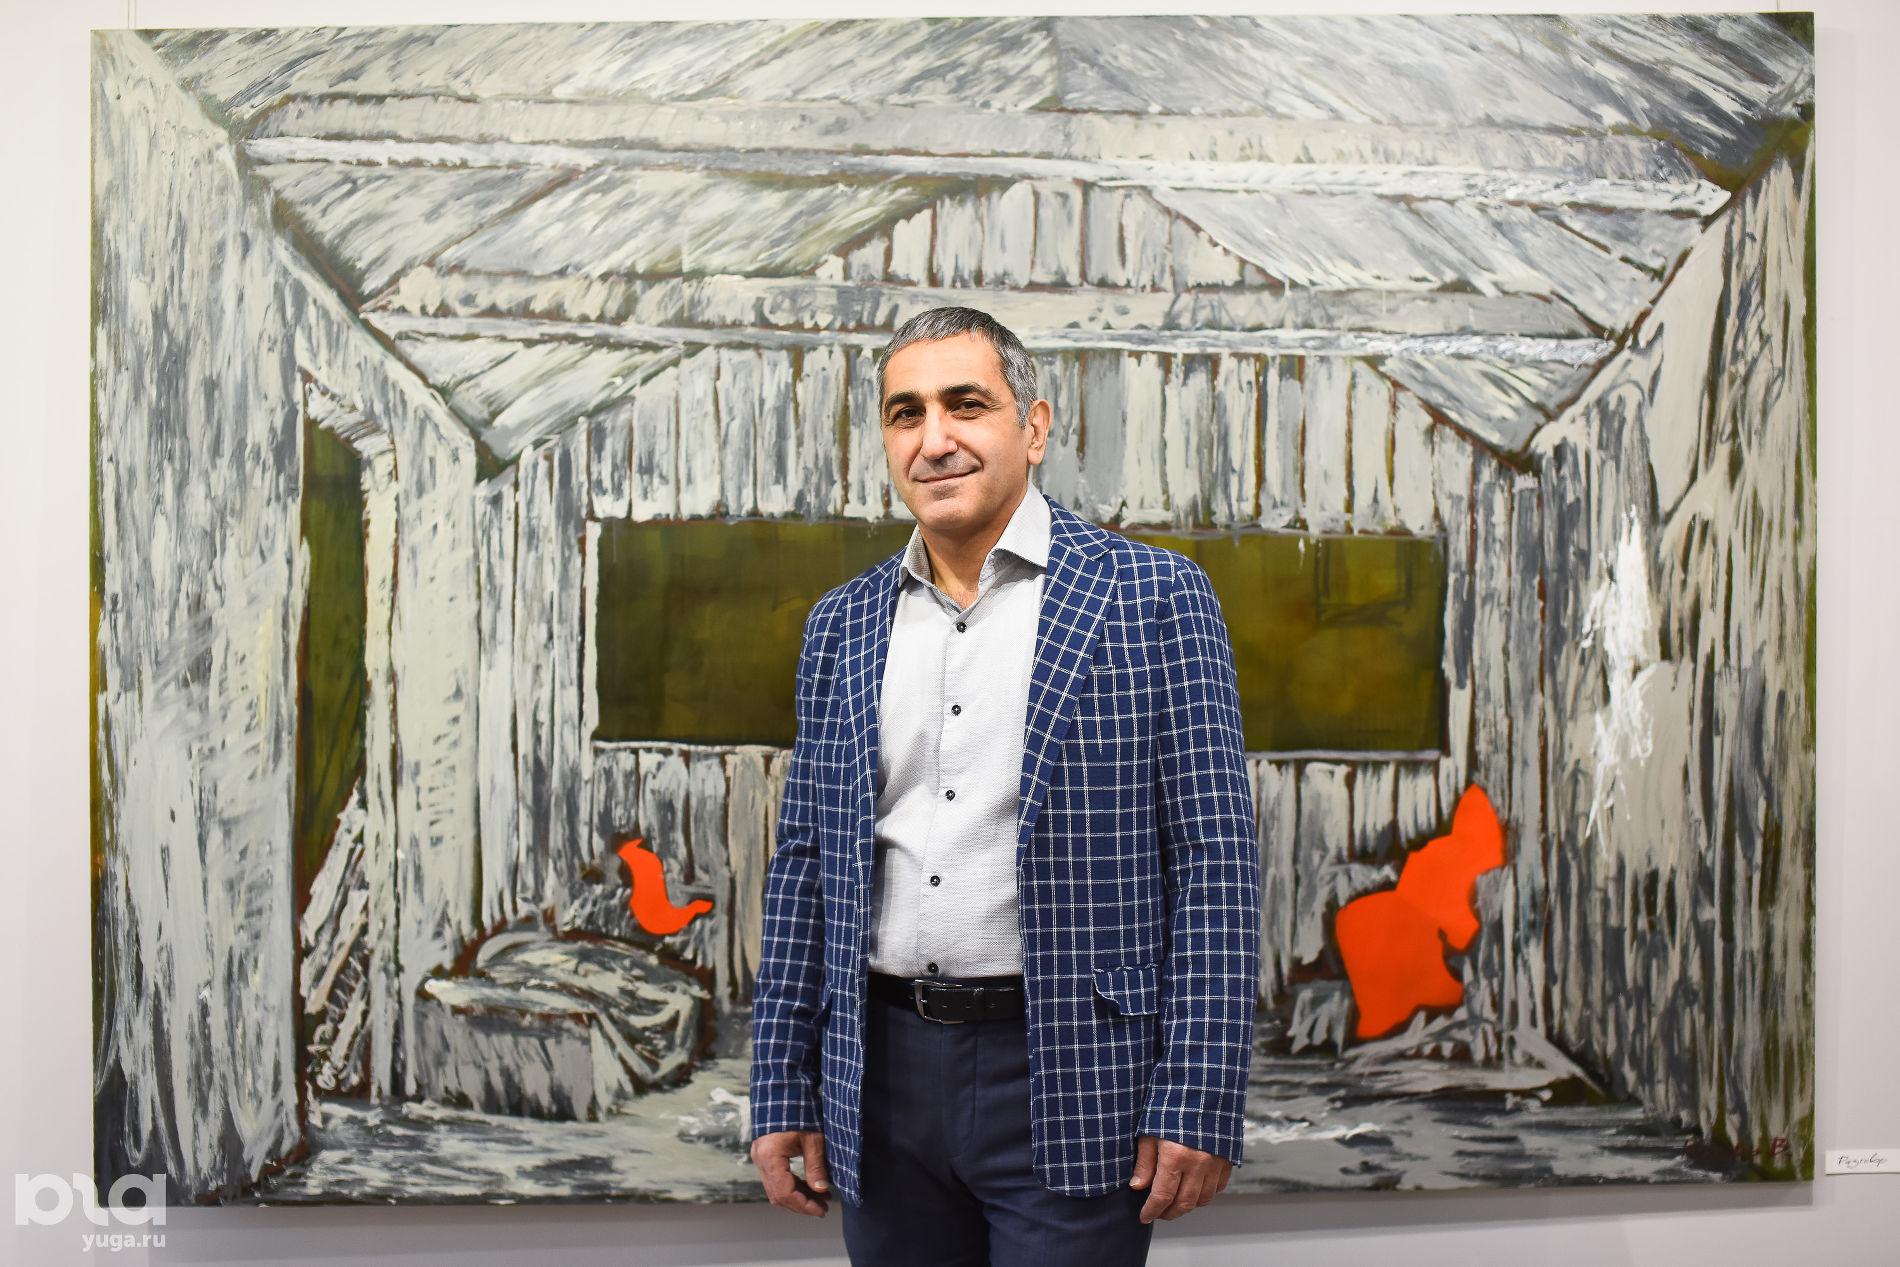 Владелец галереи «Доротея» Артур Григорян на фоне картины Владимира Кухаря «Разговор» ©Фото Елены Синеок, Юга.ру